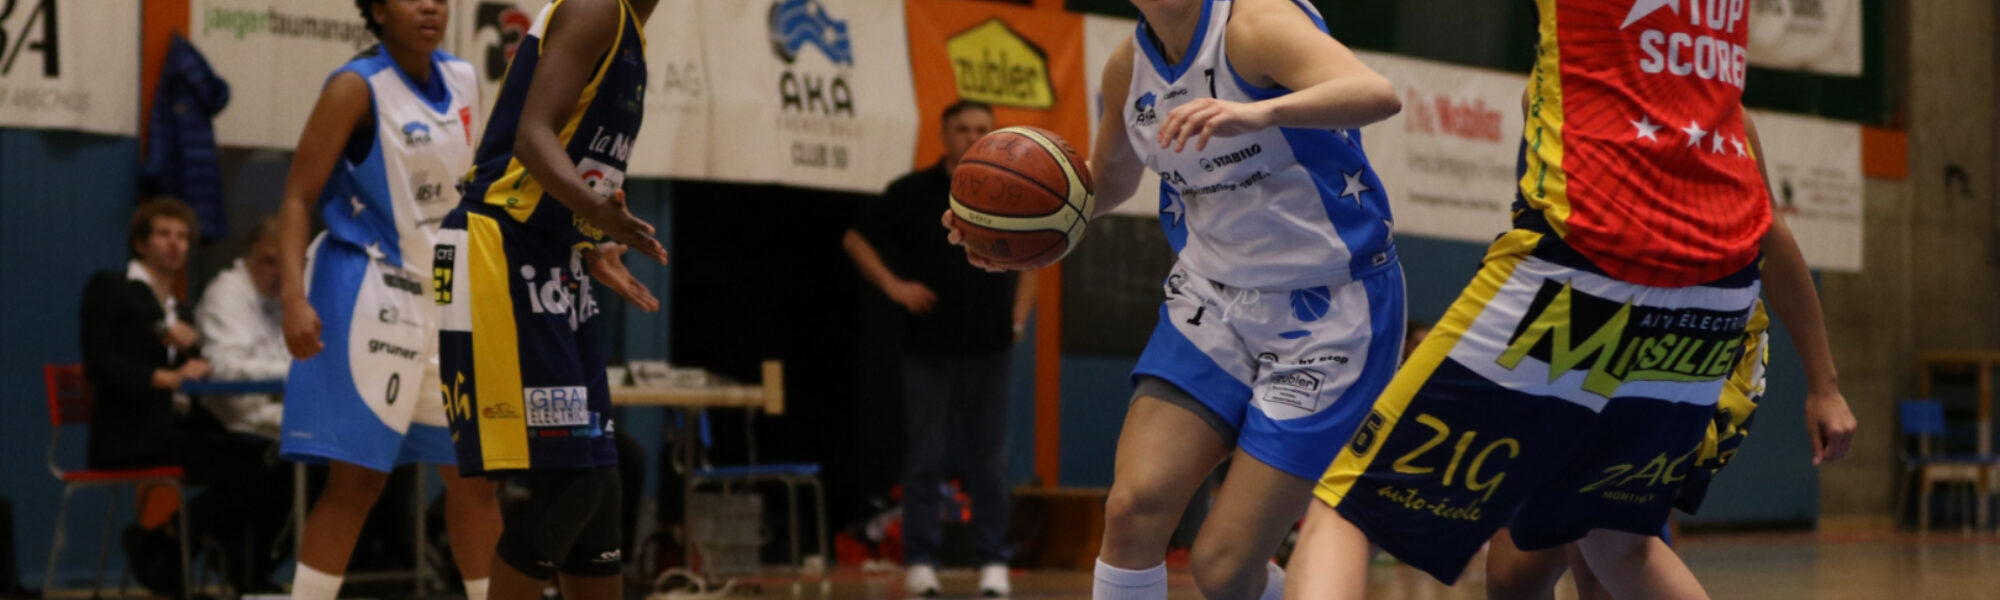 Basketballclub Alte Kanti Aarau